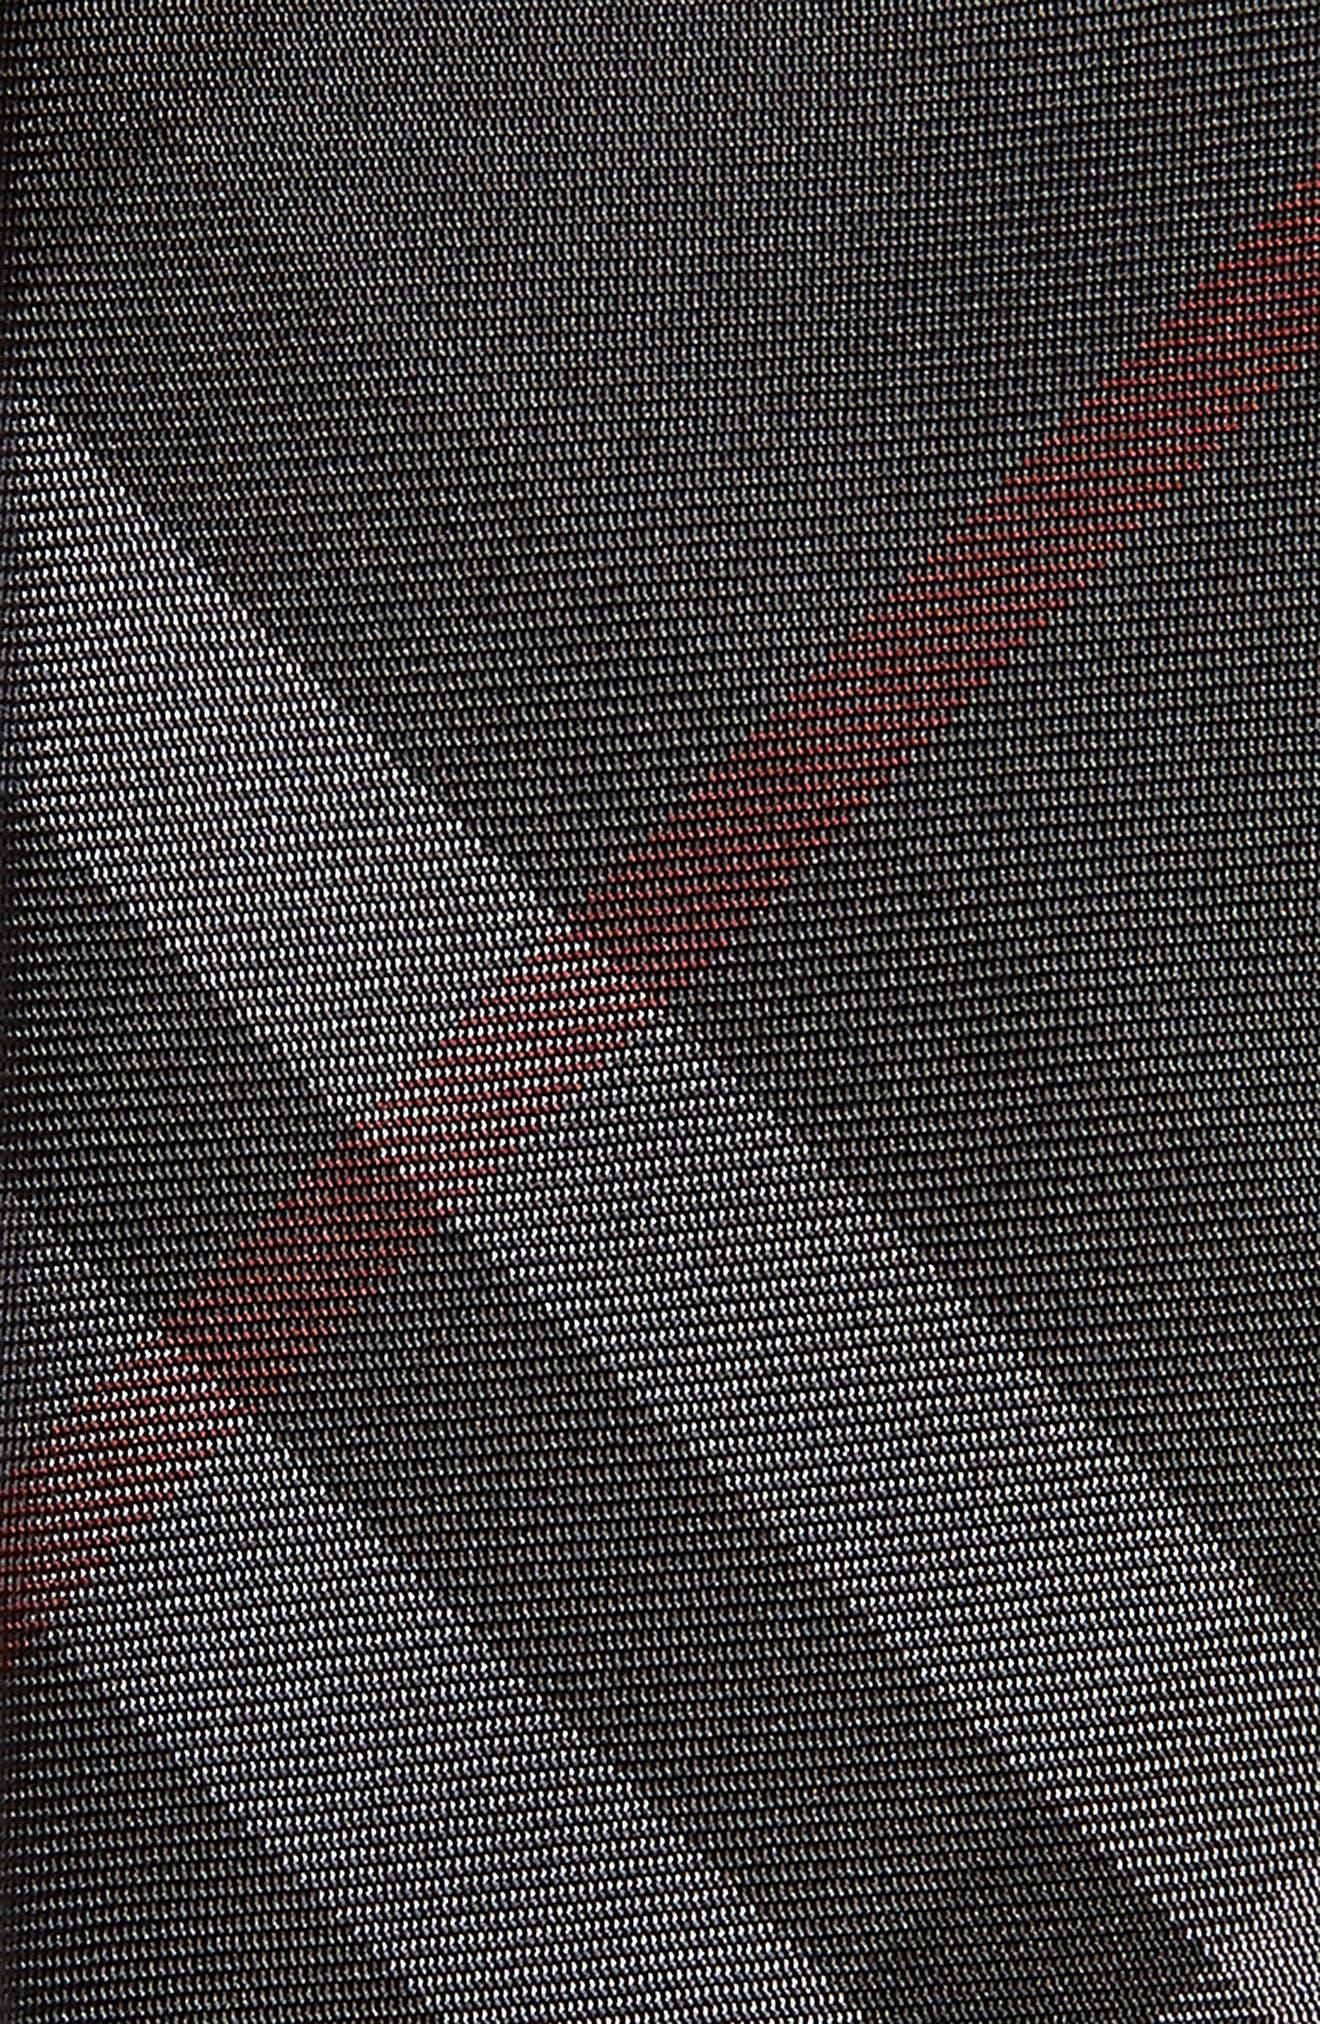 Manston Check Silk Tie,                             Alternate thumbnail 2, color,                             DARK CHARCOAL